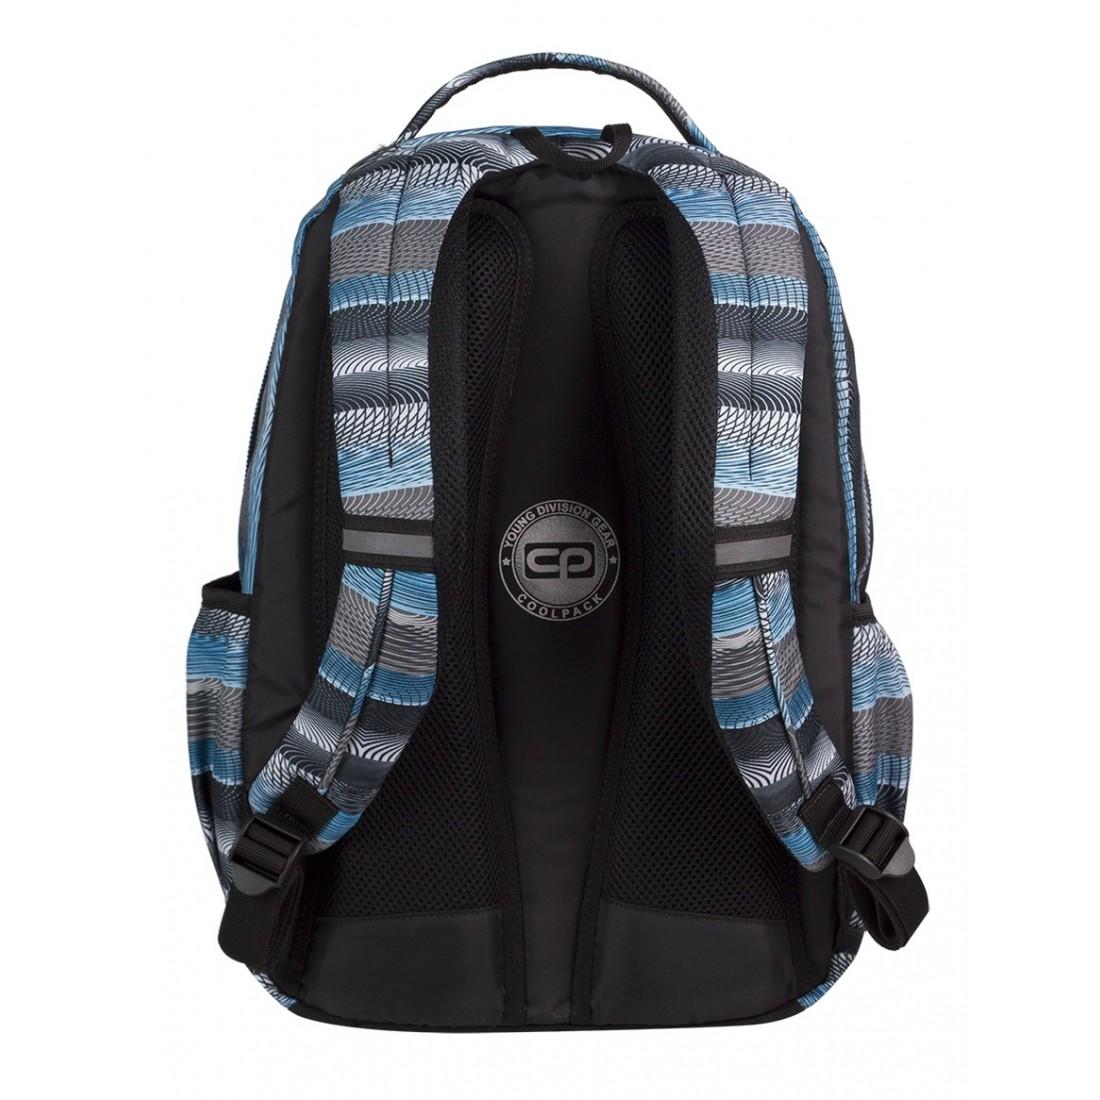 Plecak młodzieżowy CoolPack SMASH GREY TWIST CP 400 - plecak-tornister.pl